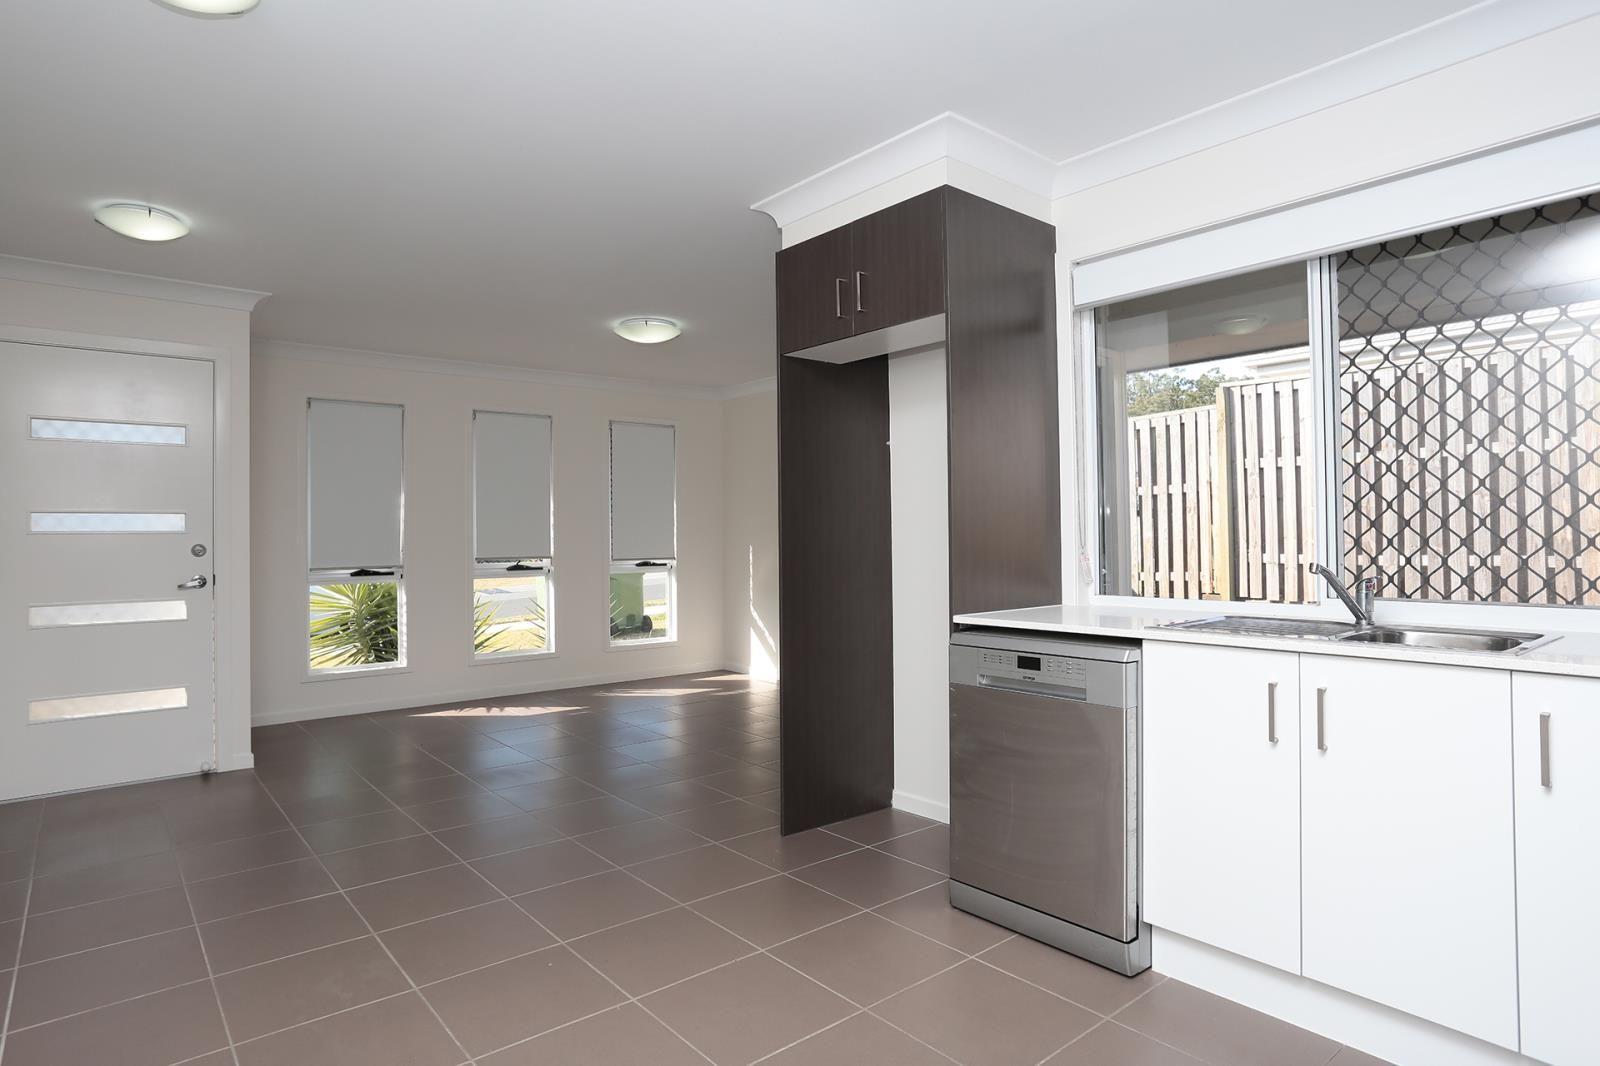 2/5 Melville Drive, Brassall QLD 4305, Image 1